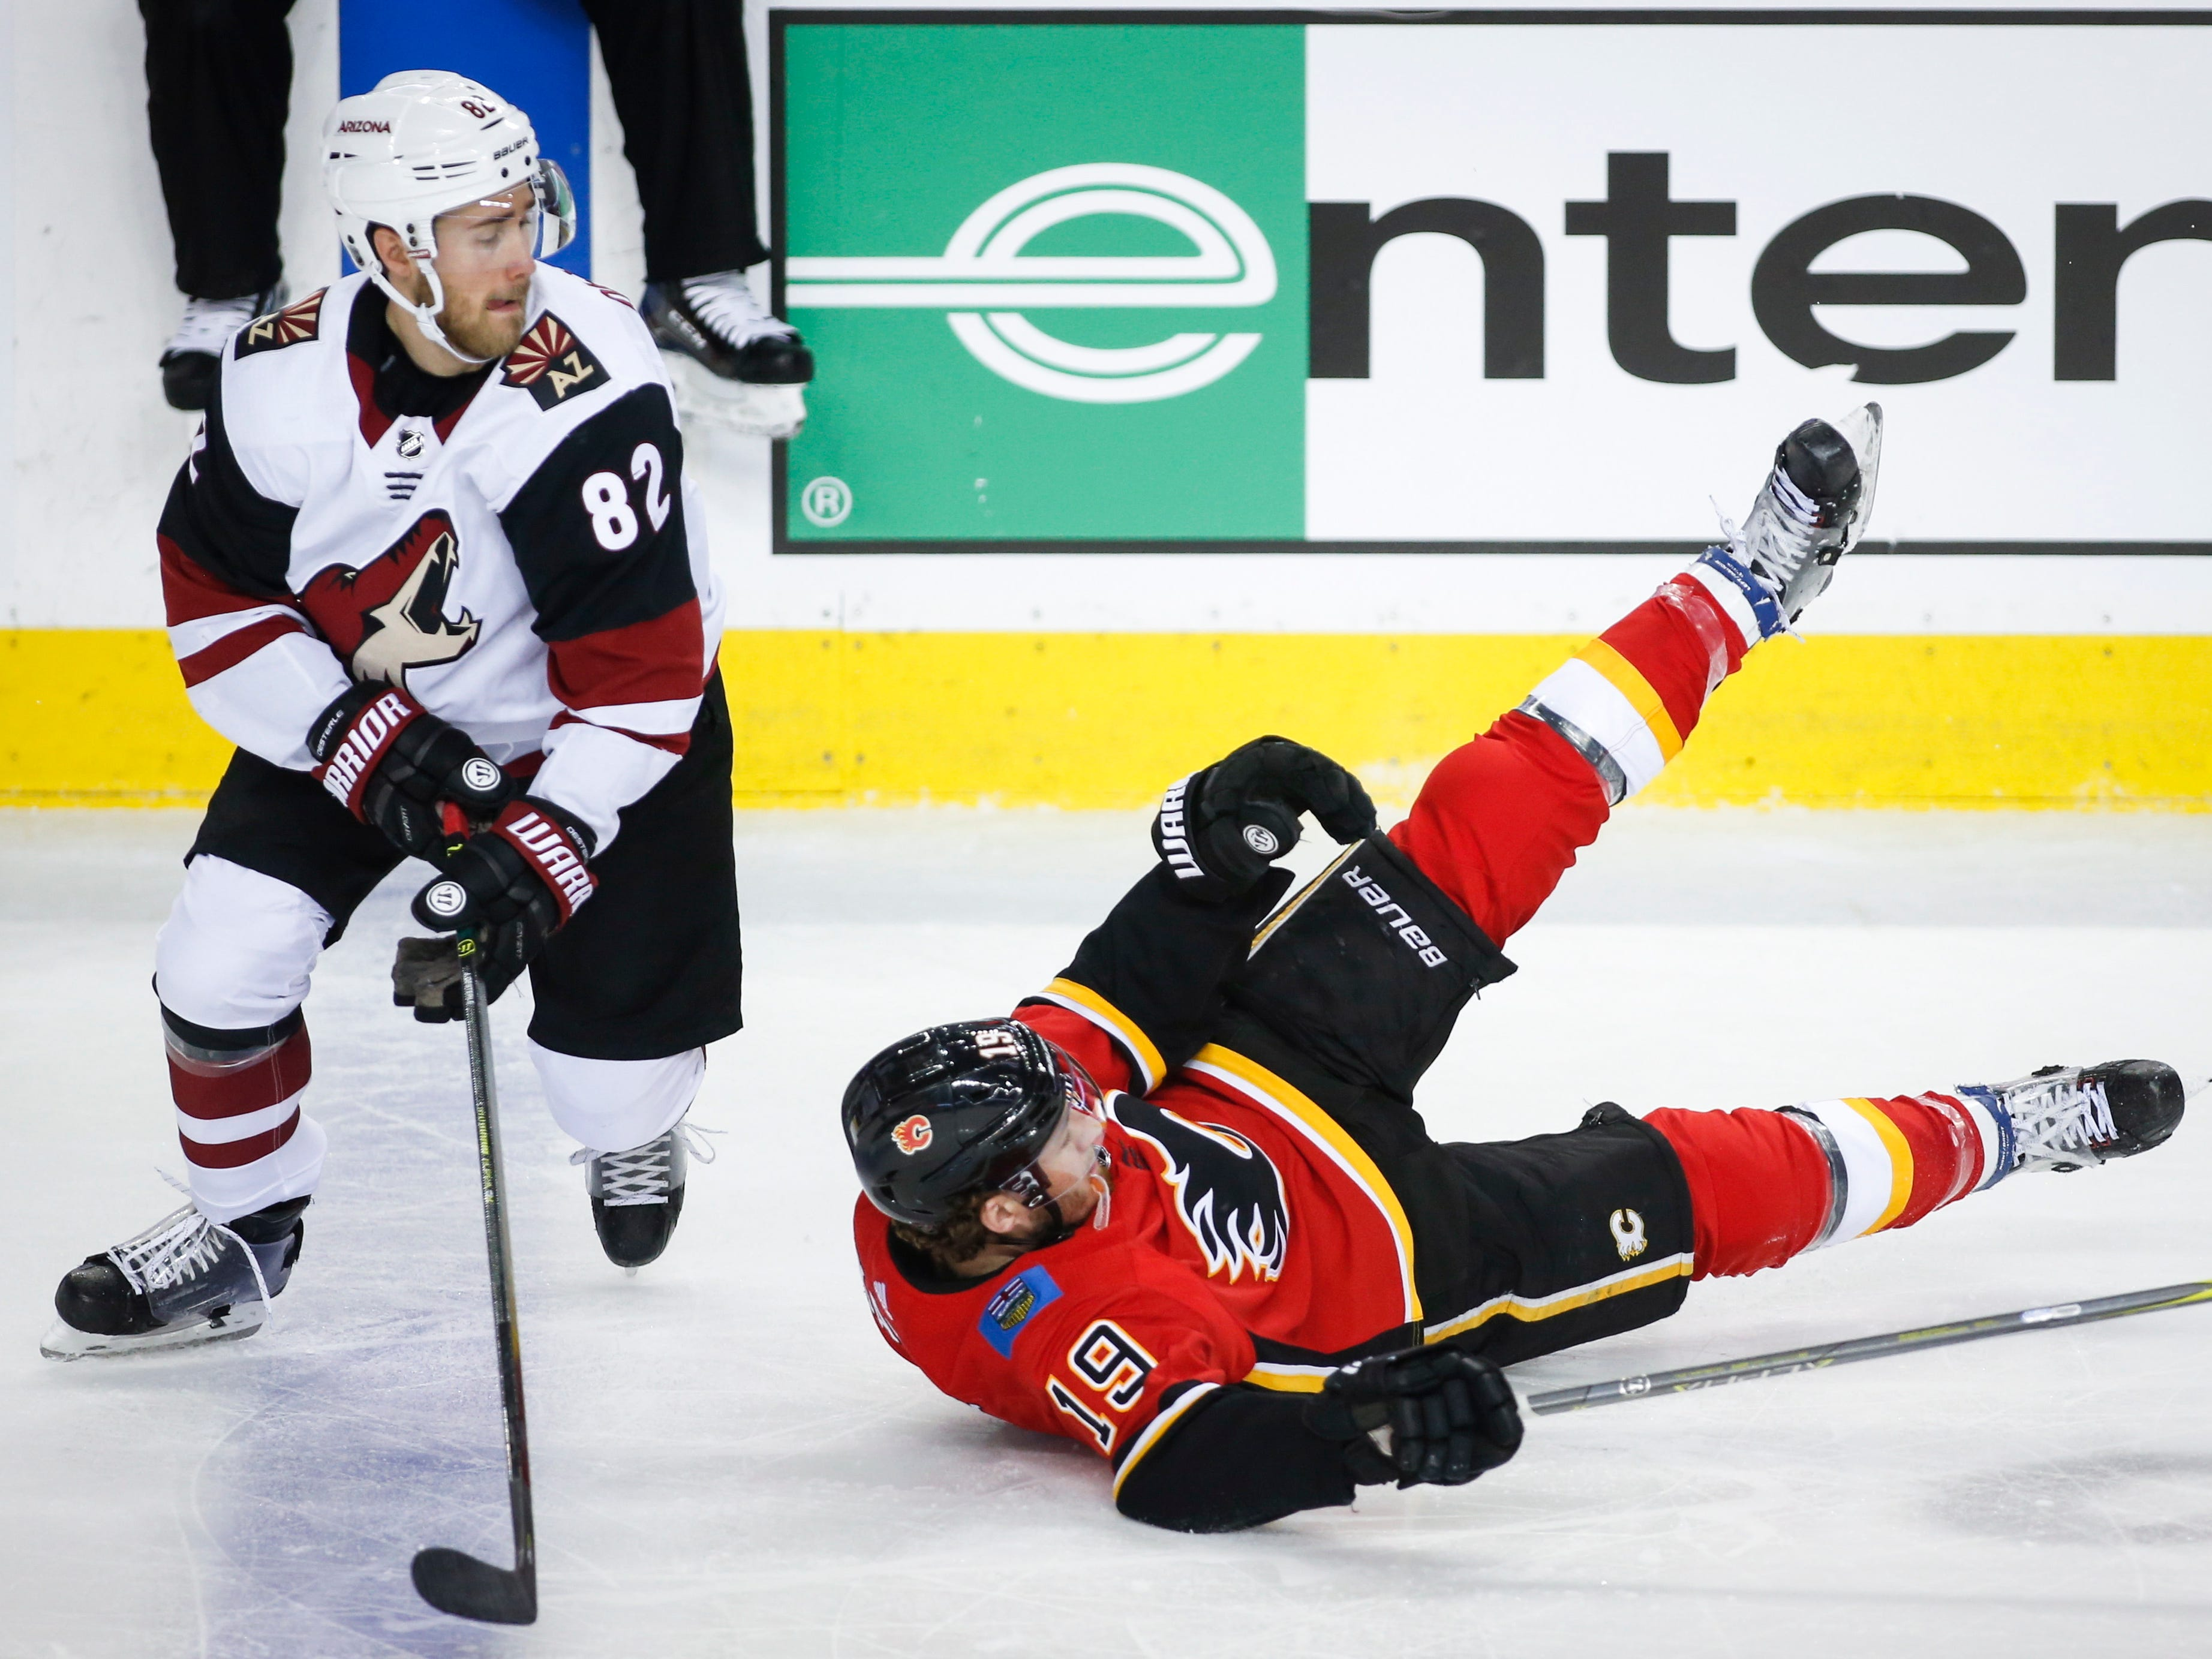 Arizona Coyotes' Jordan Oesterle, left, knocks Calgary Flames' Matthew Tkachuk to the ice during first period NHL hockey action in  Calgary, Alberta, Monday, Feb. 18, 2019.